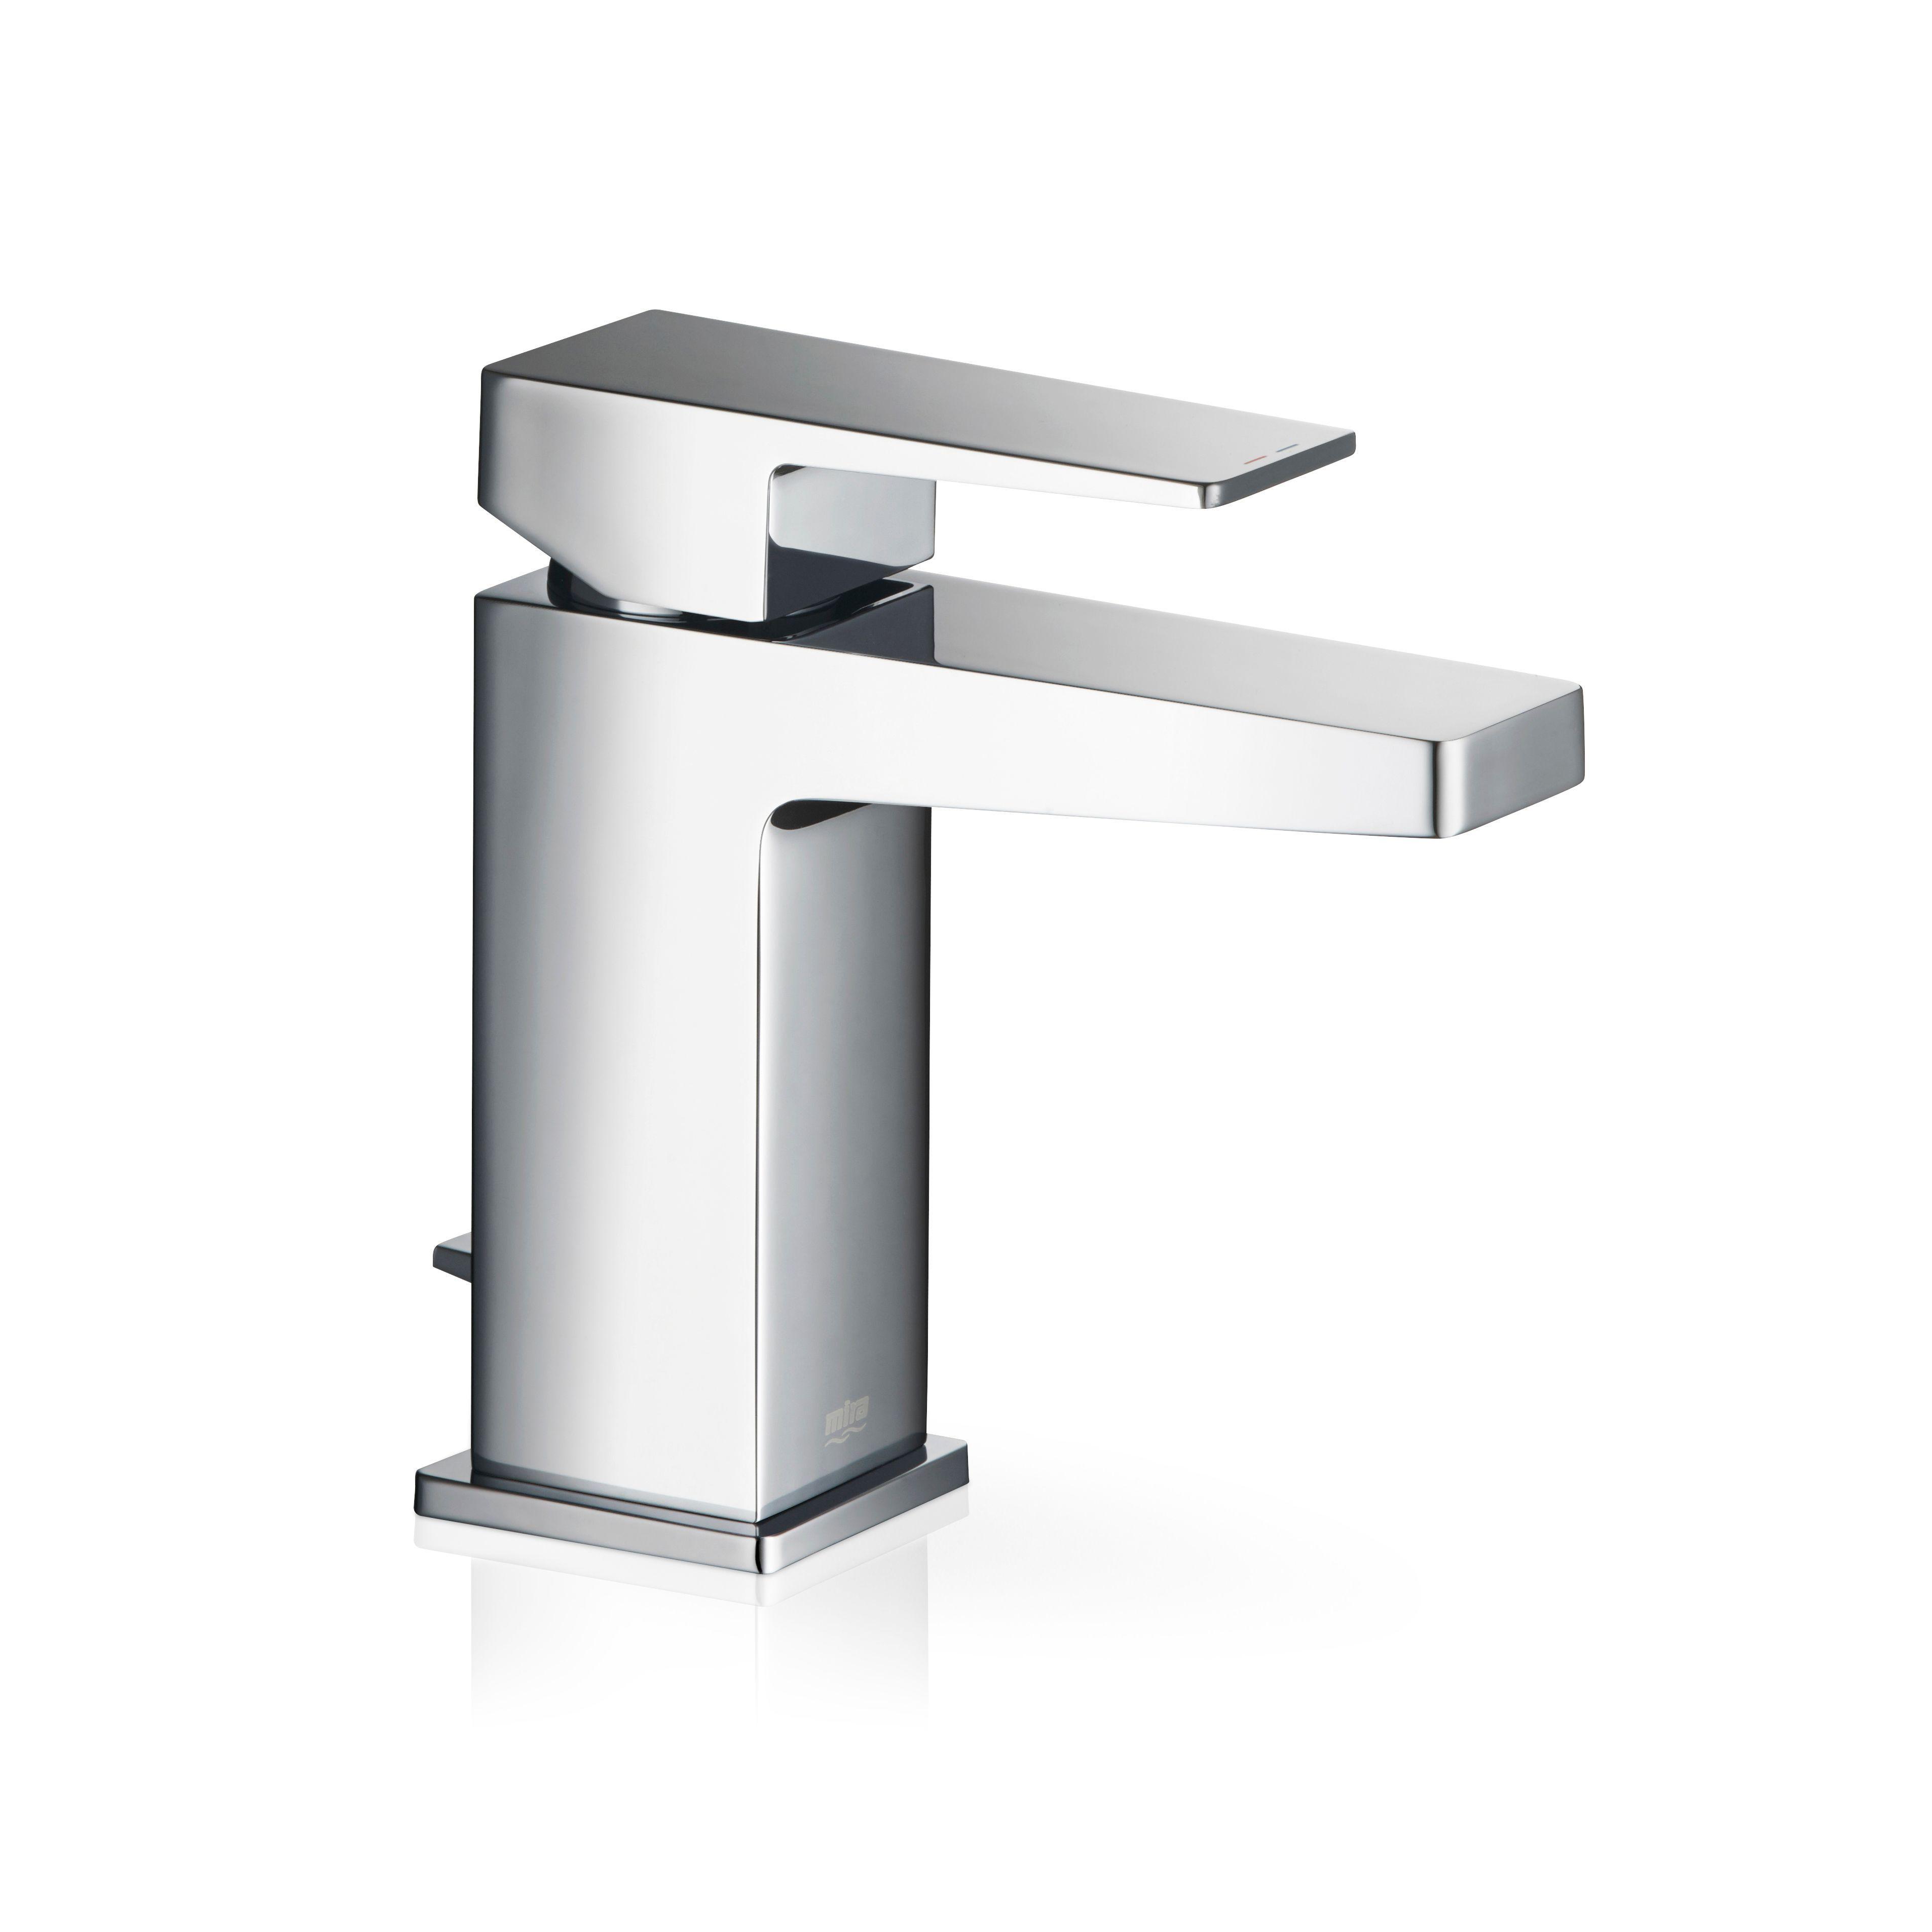 Mira Honesty 1 Lever Basin Mixer Tap | Departments | DIY ...